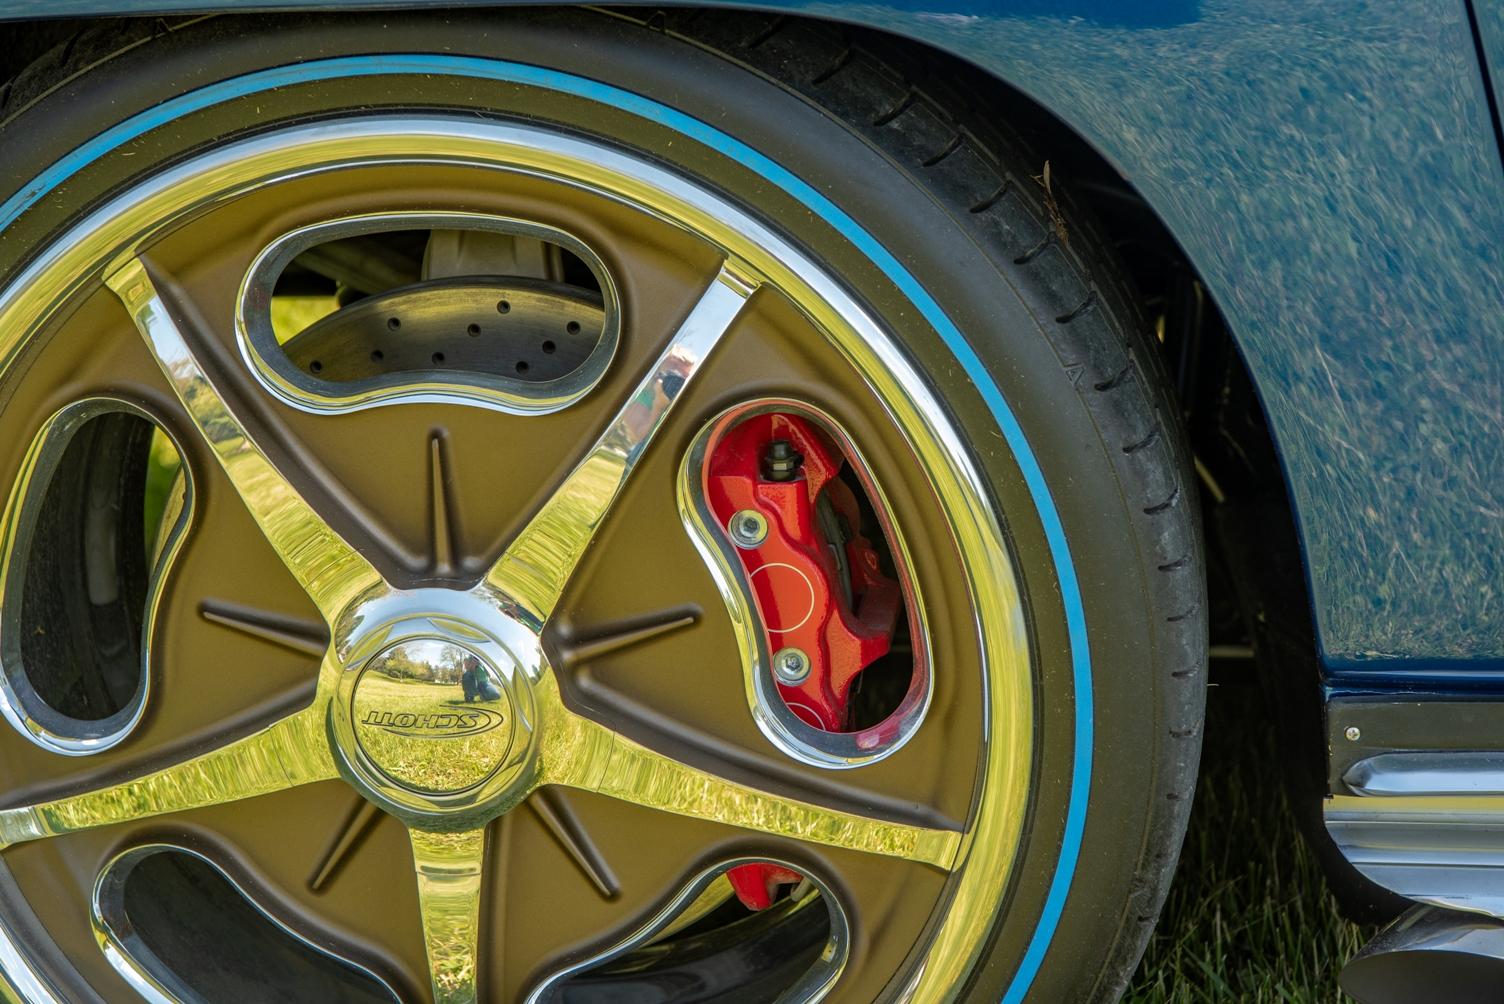 Accelerator Schott wheels wrapped in Diamond Back Blueline tires hide the Z06 brakes